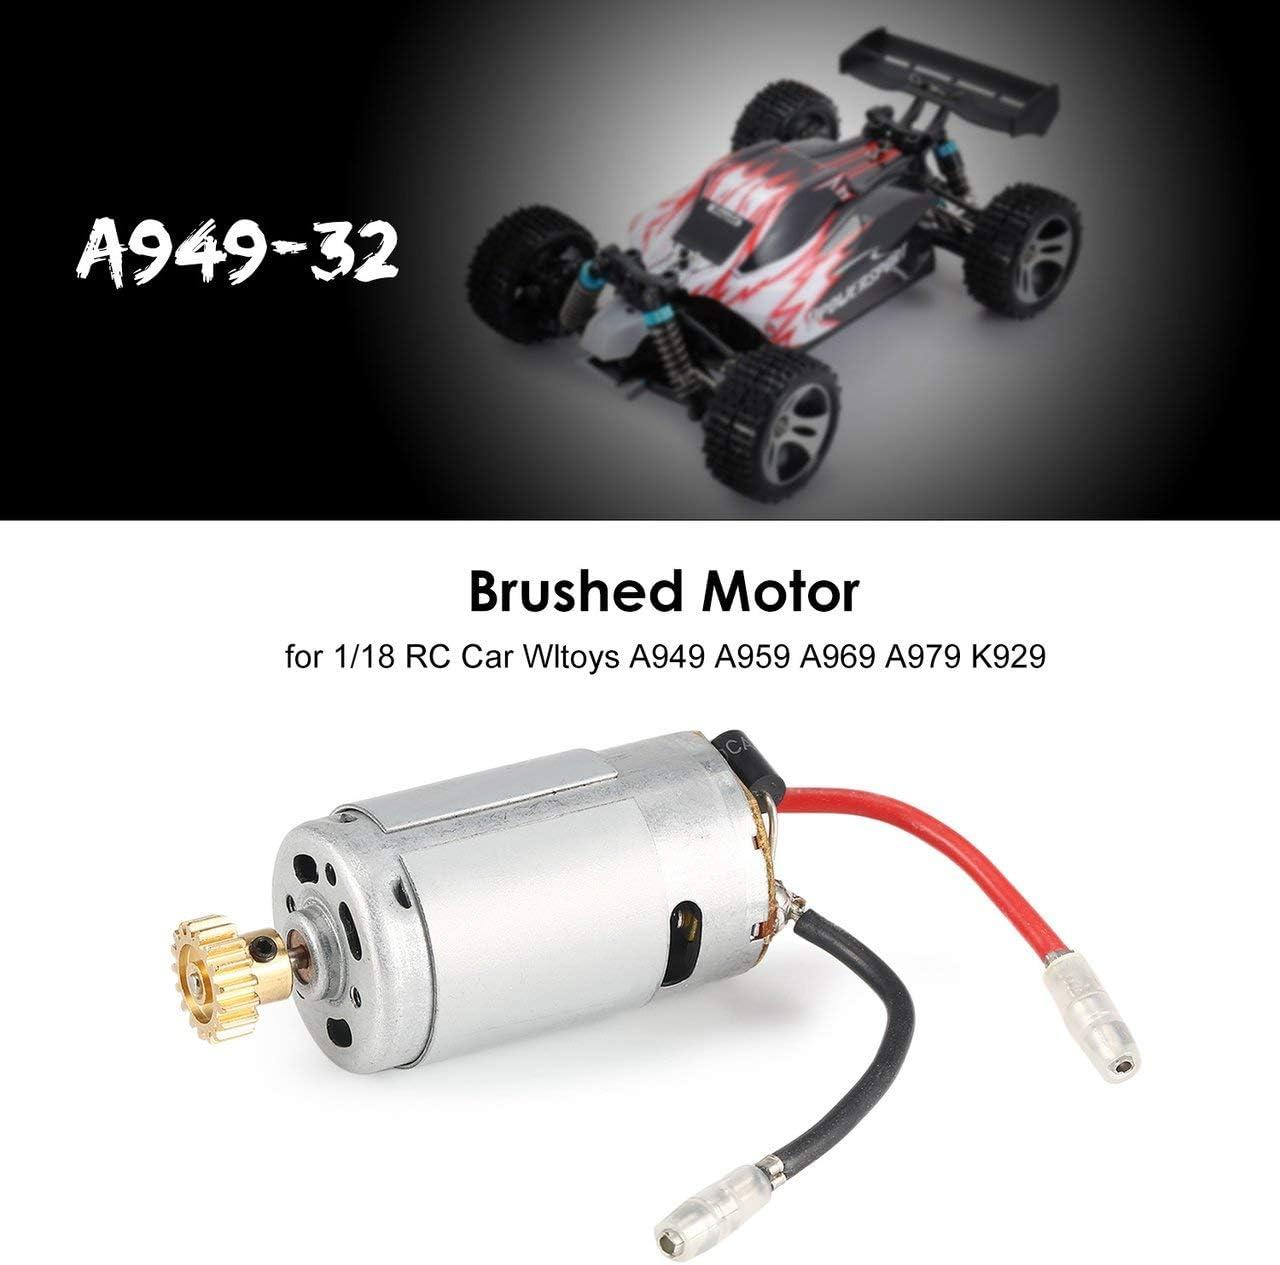 sumicorp.com DEjasnyfall Silber 1/18 RC Car Brushed Motor A949-32 ...